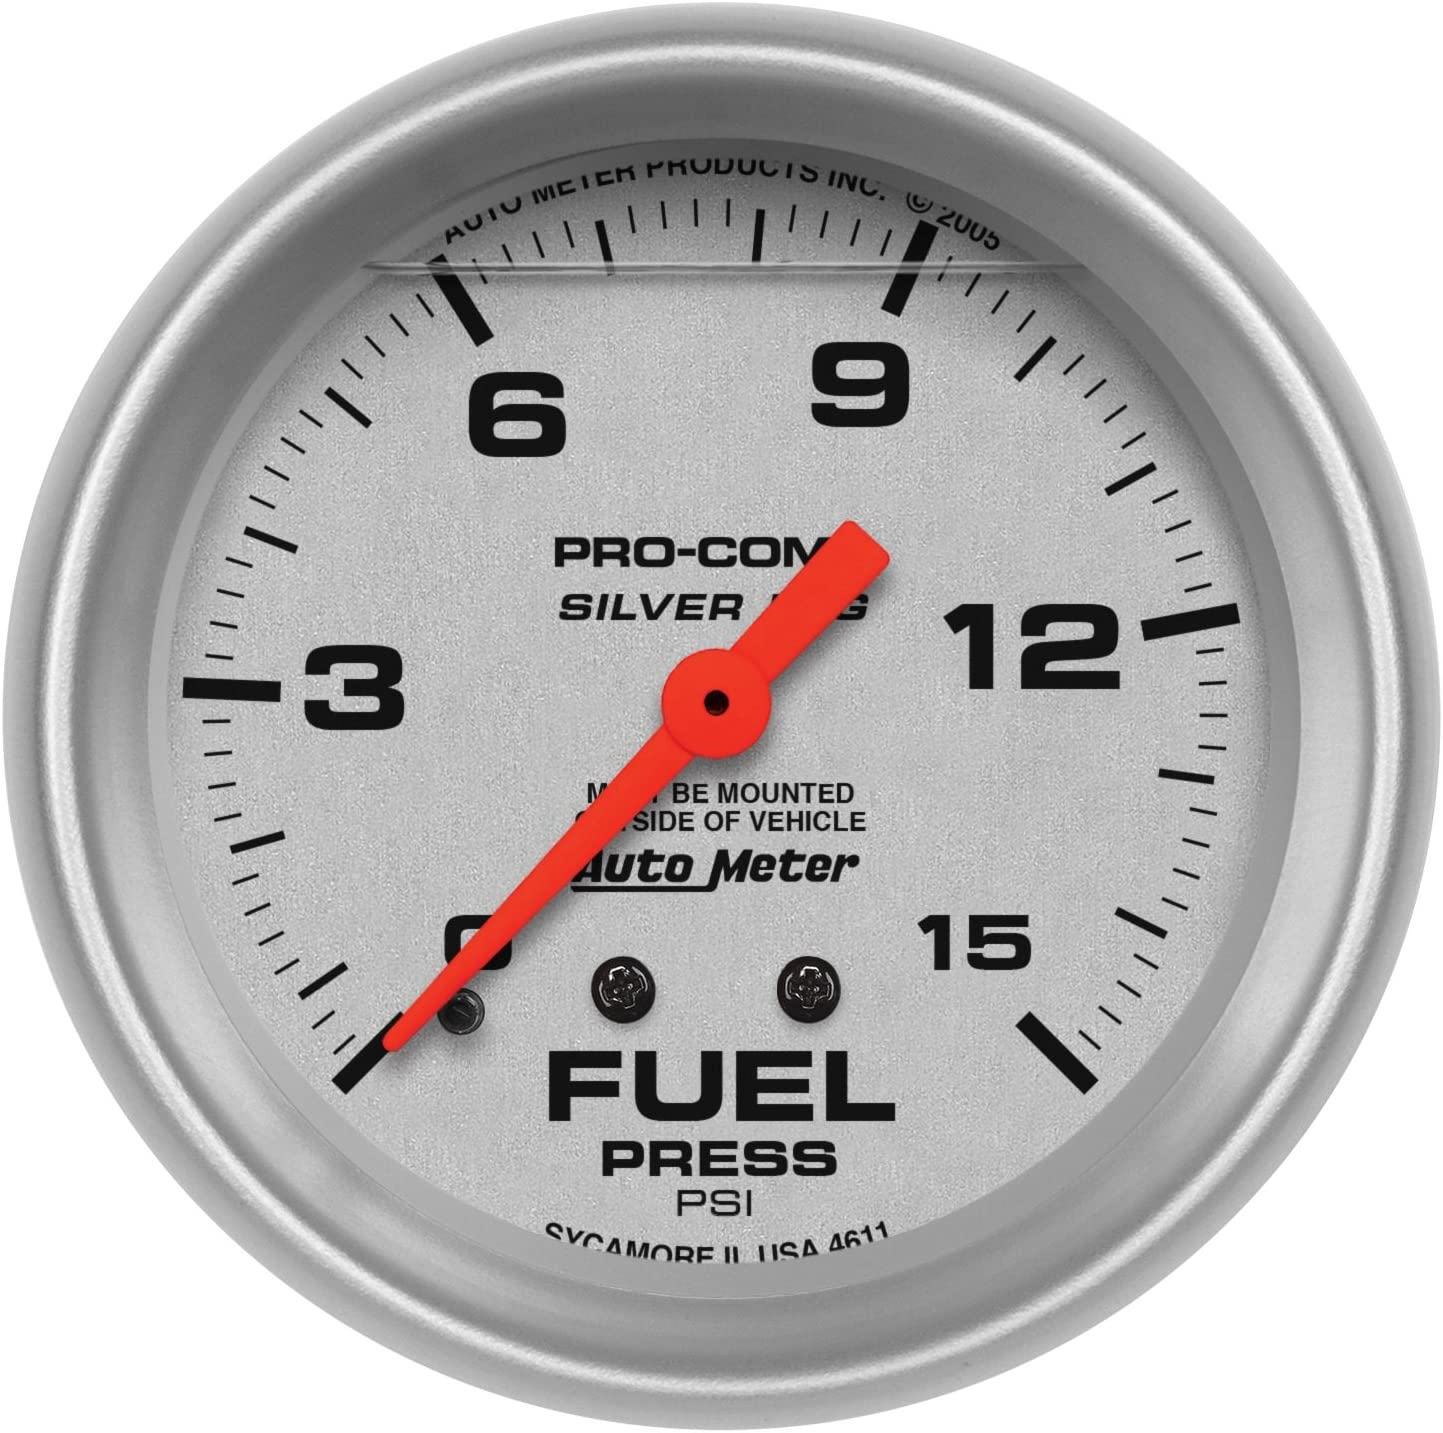 Auto Meter 4611 Silver LFGs Fuel Pressure Gauge